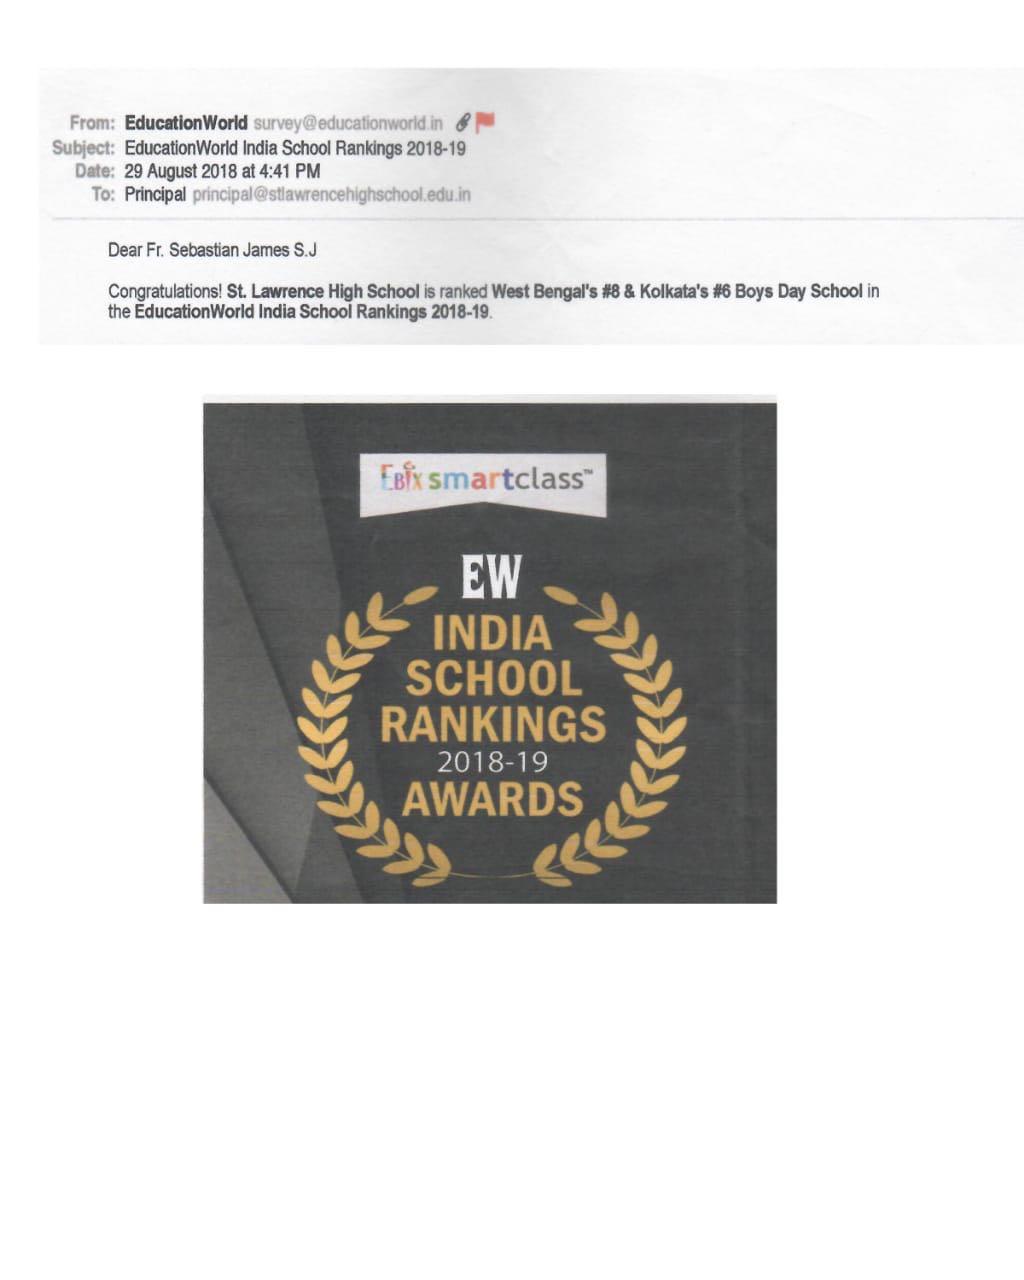 EW india school rankings